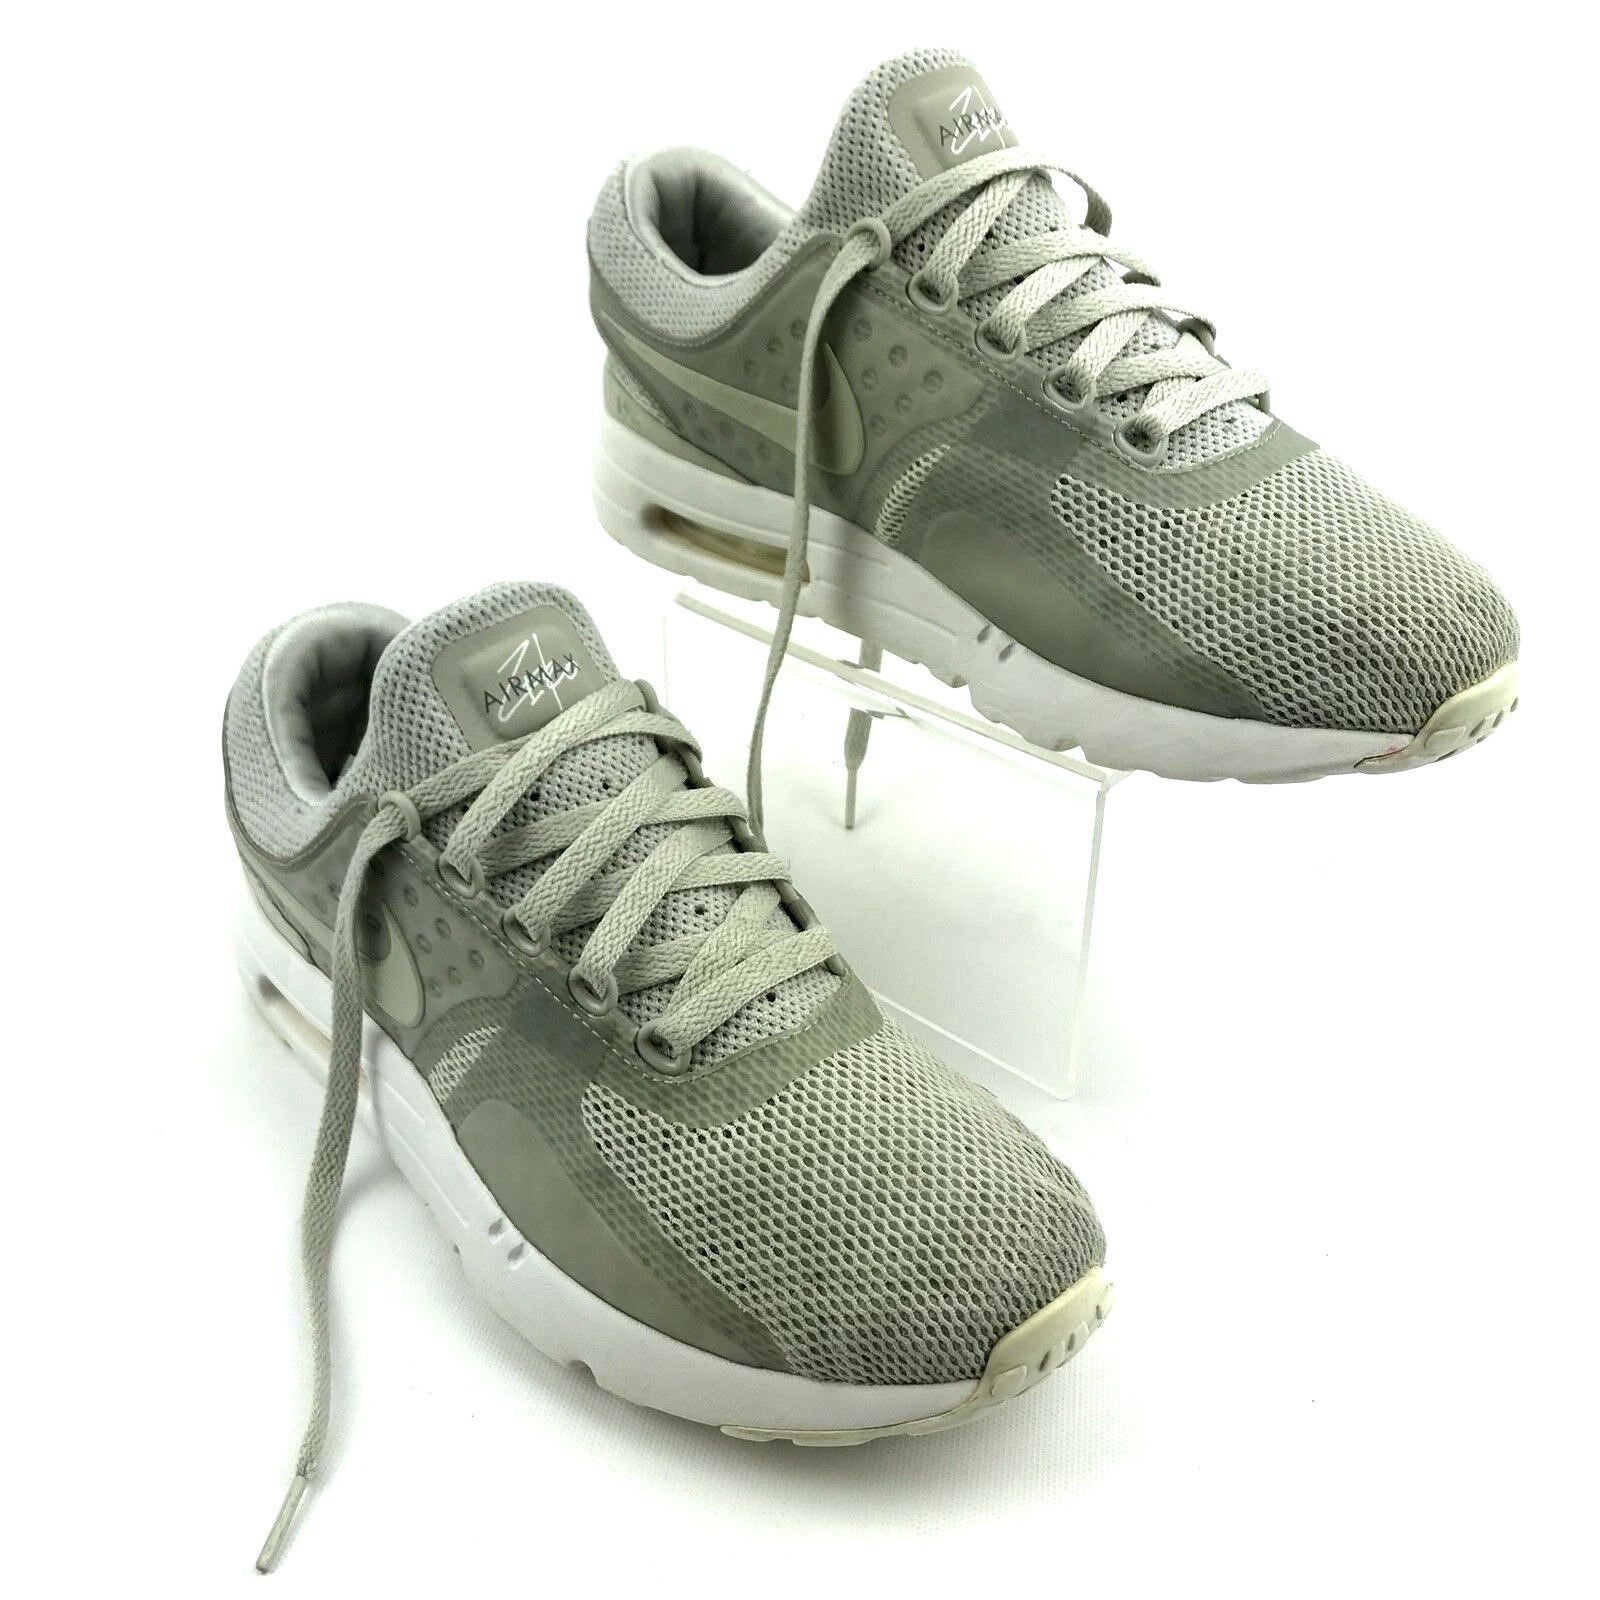 Nike Air Max Zero BR Pale Grey Pale Grey 903892-002 Men's Size 9.5 US